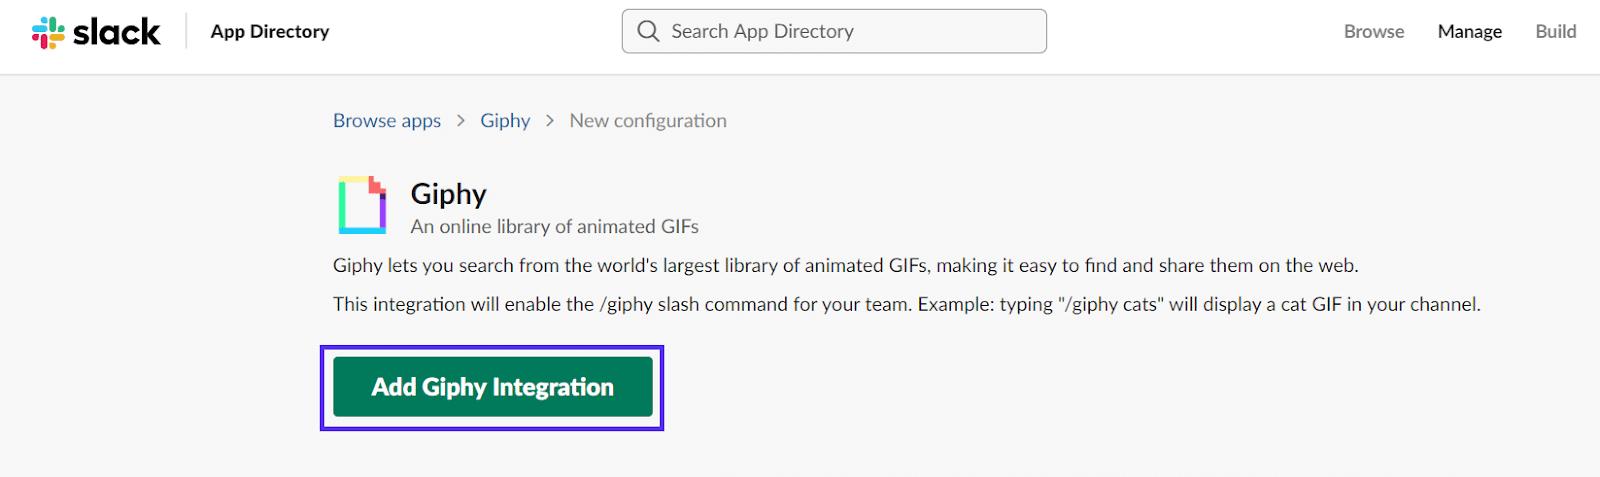 Giphyインテグレーションを追加